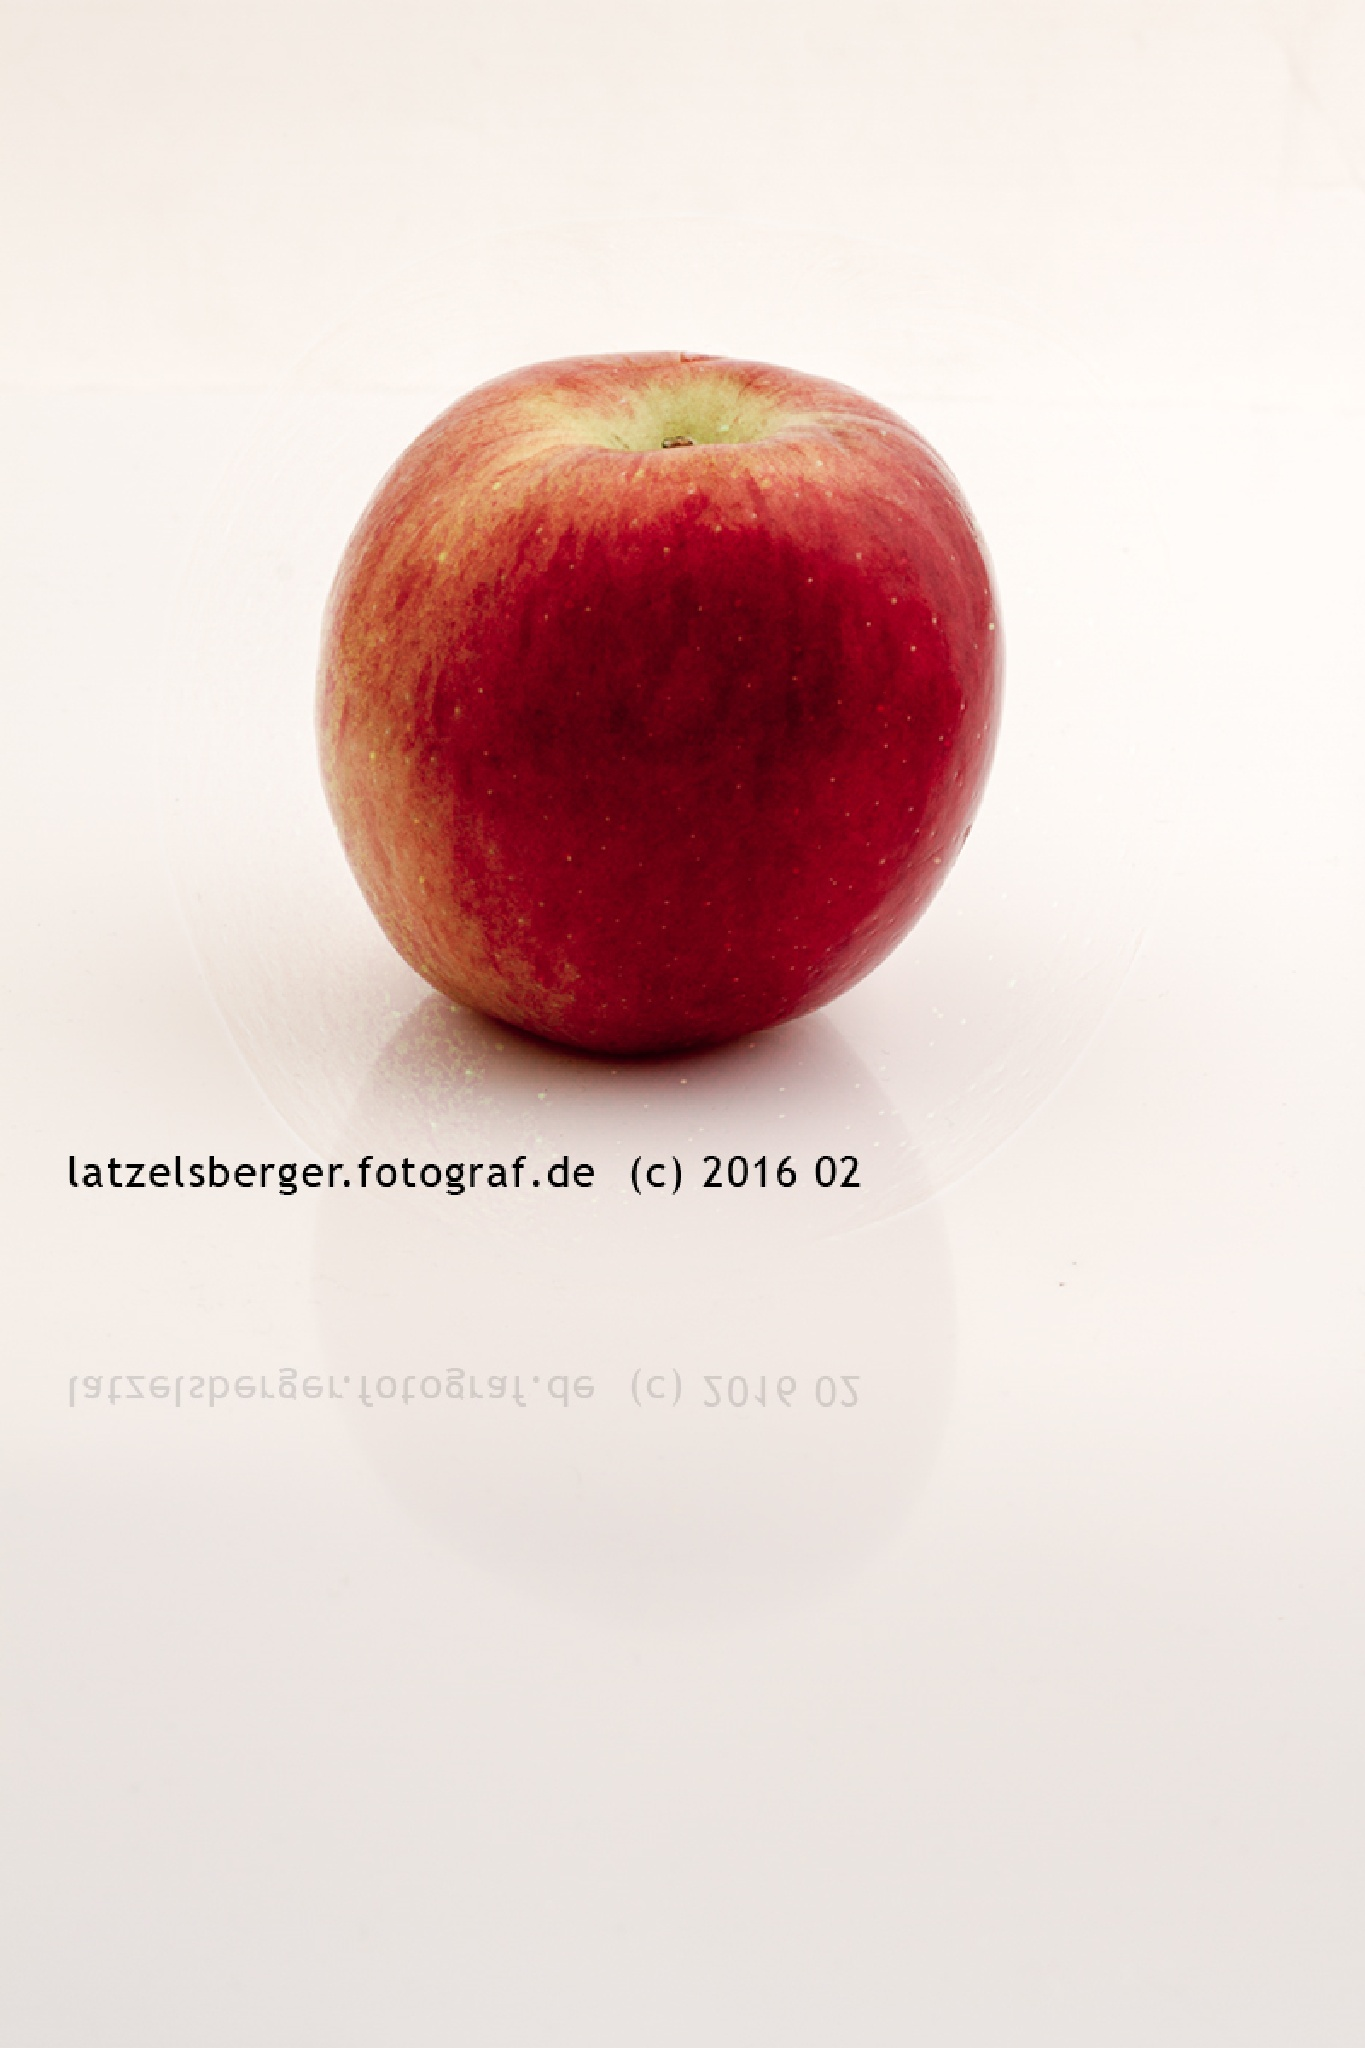 apple by erich latzelsberger